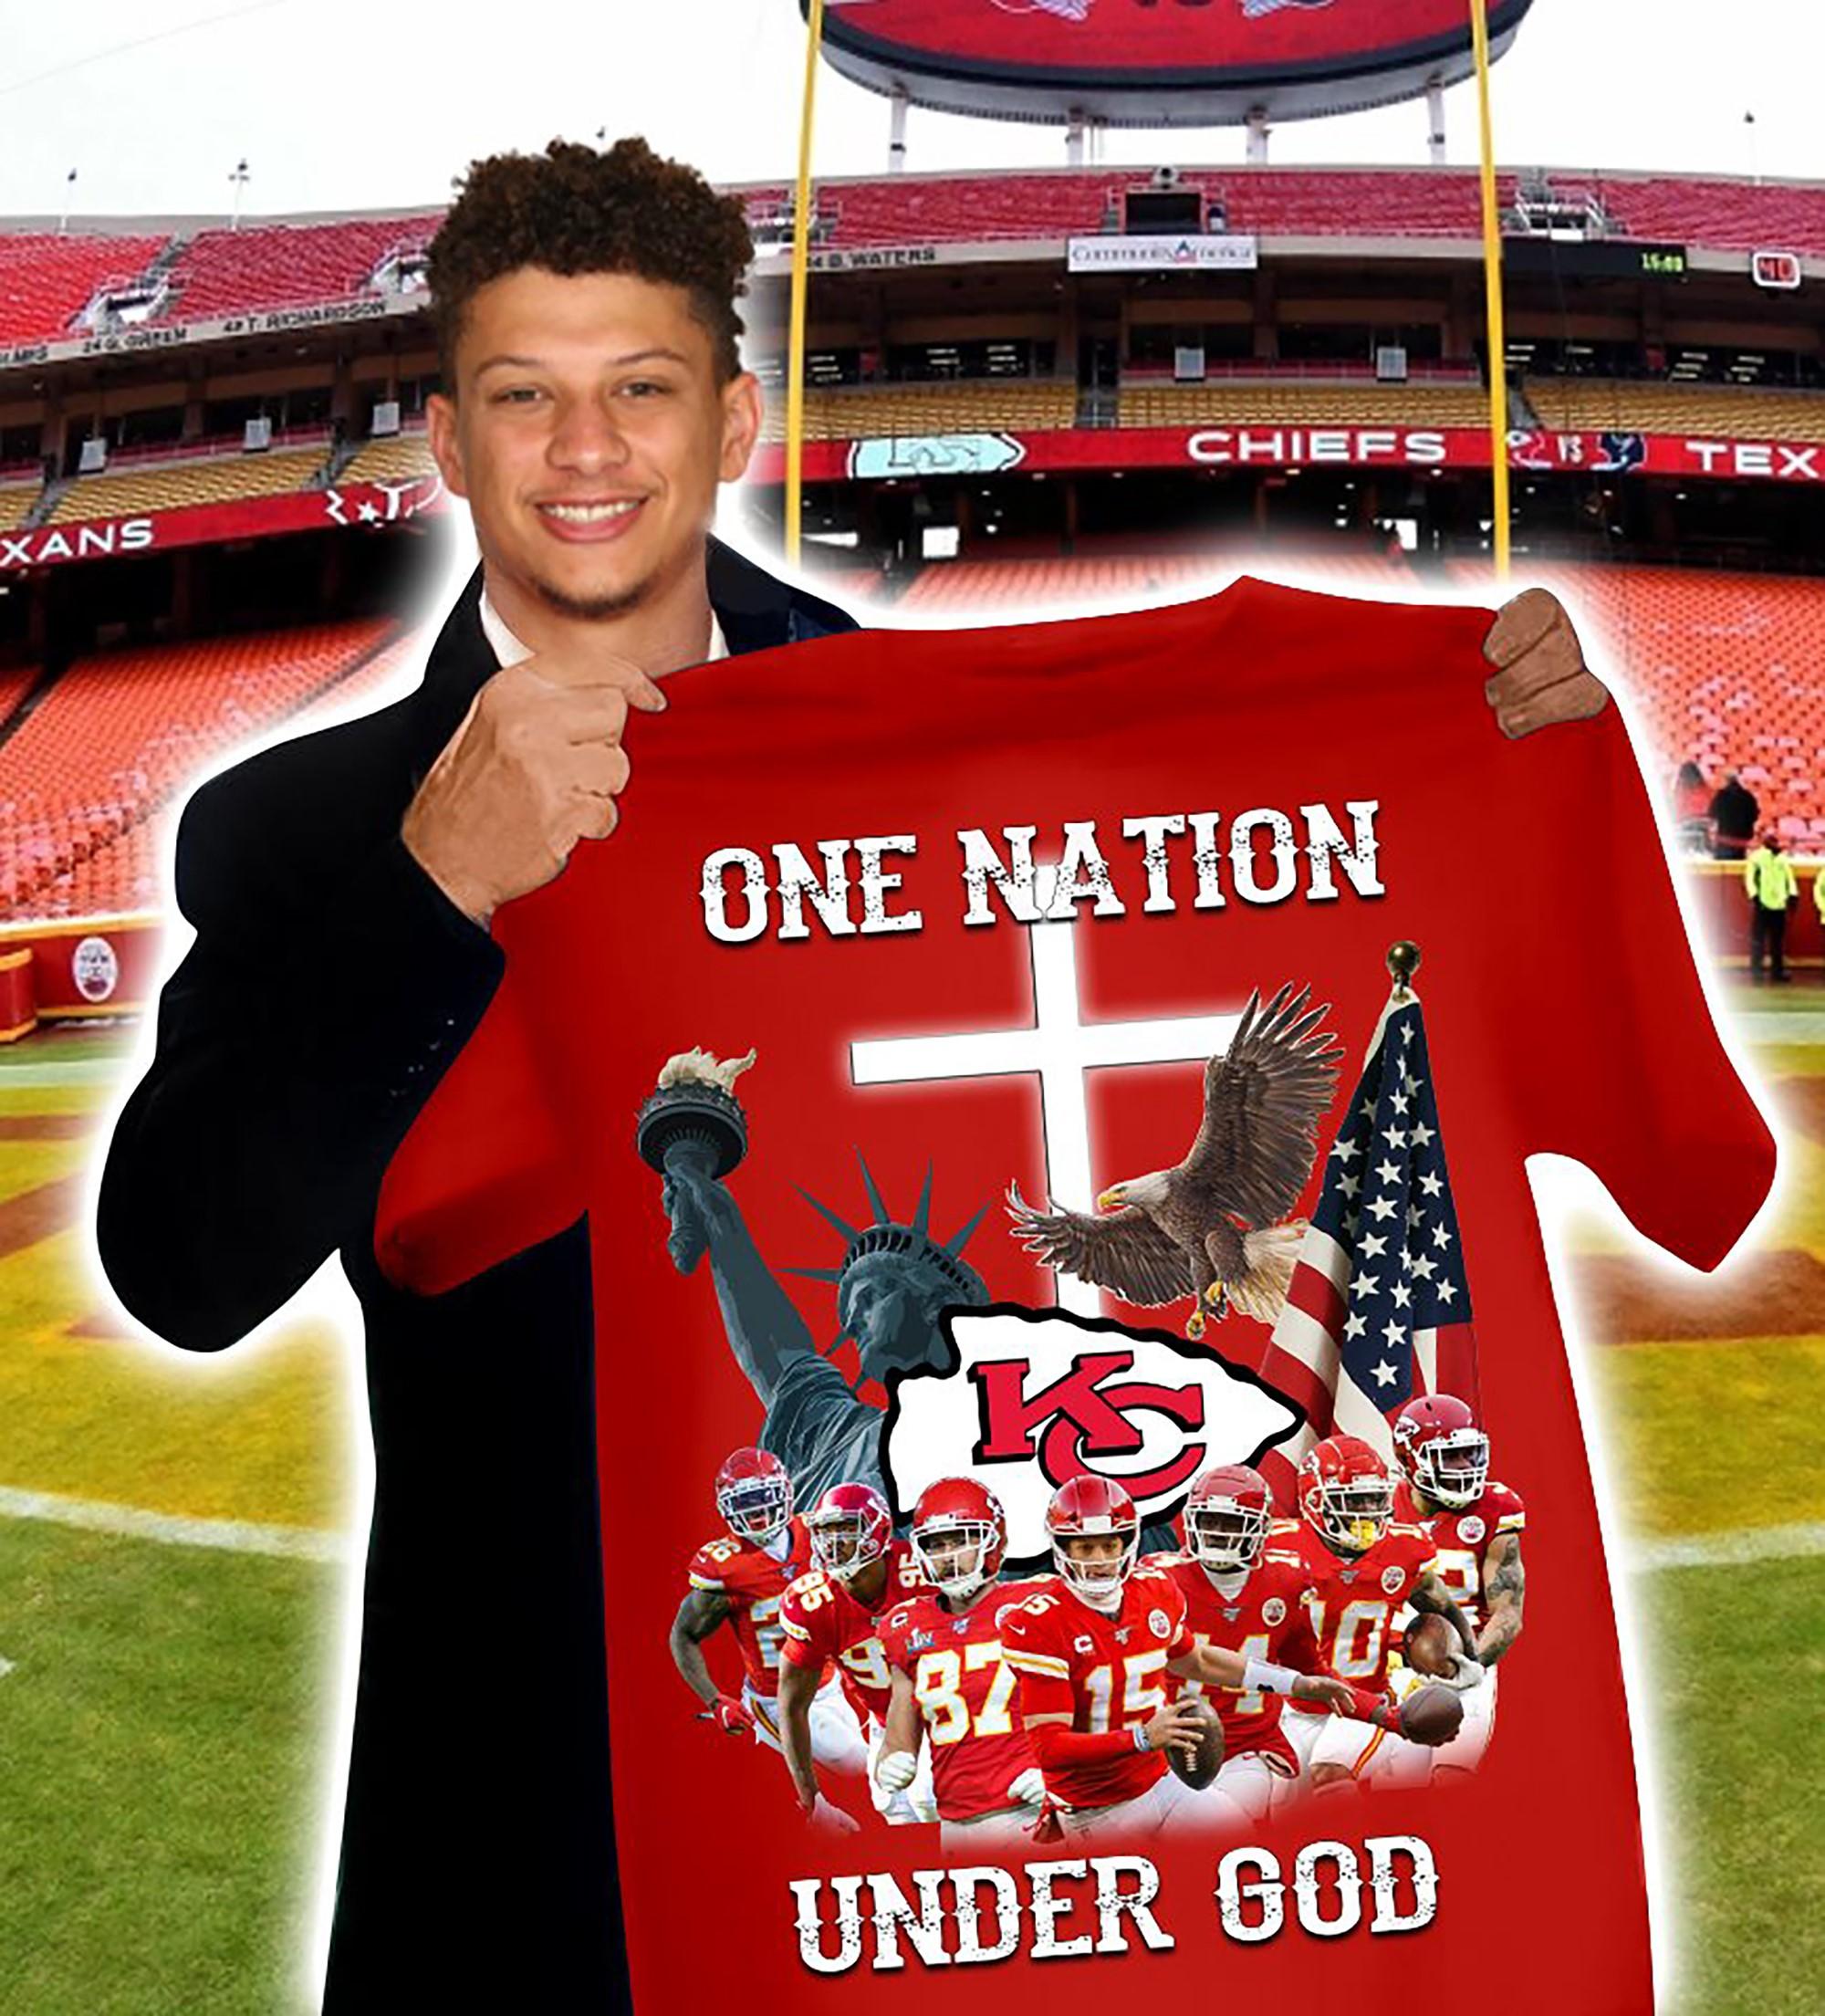 Kansas City Chiefs One Nation Under God T-shirt